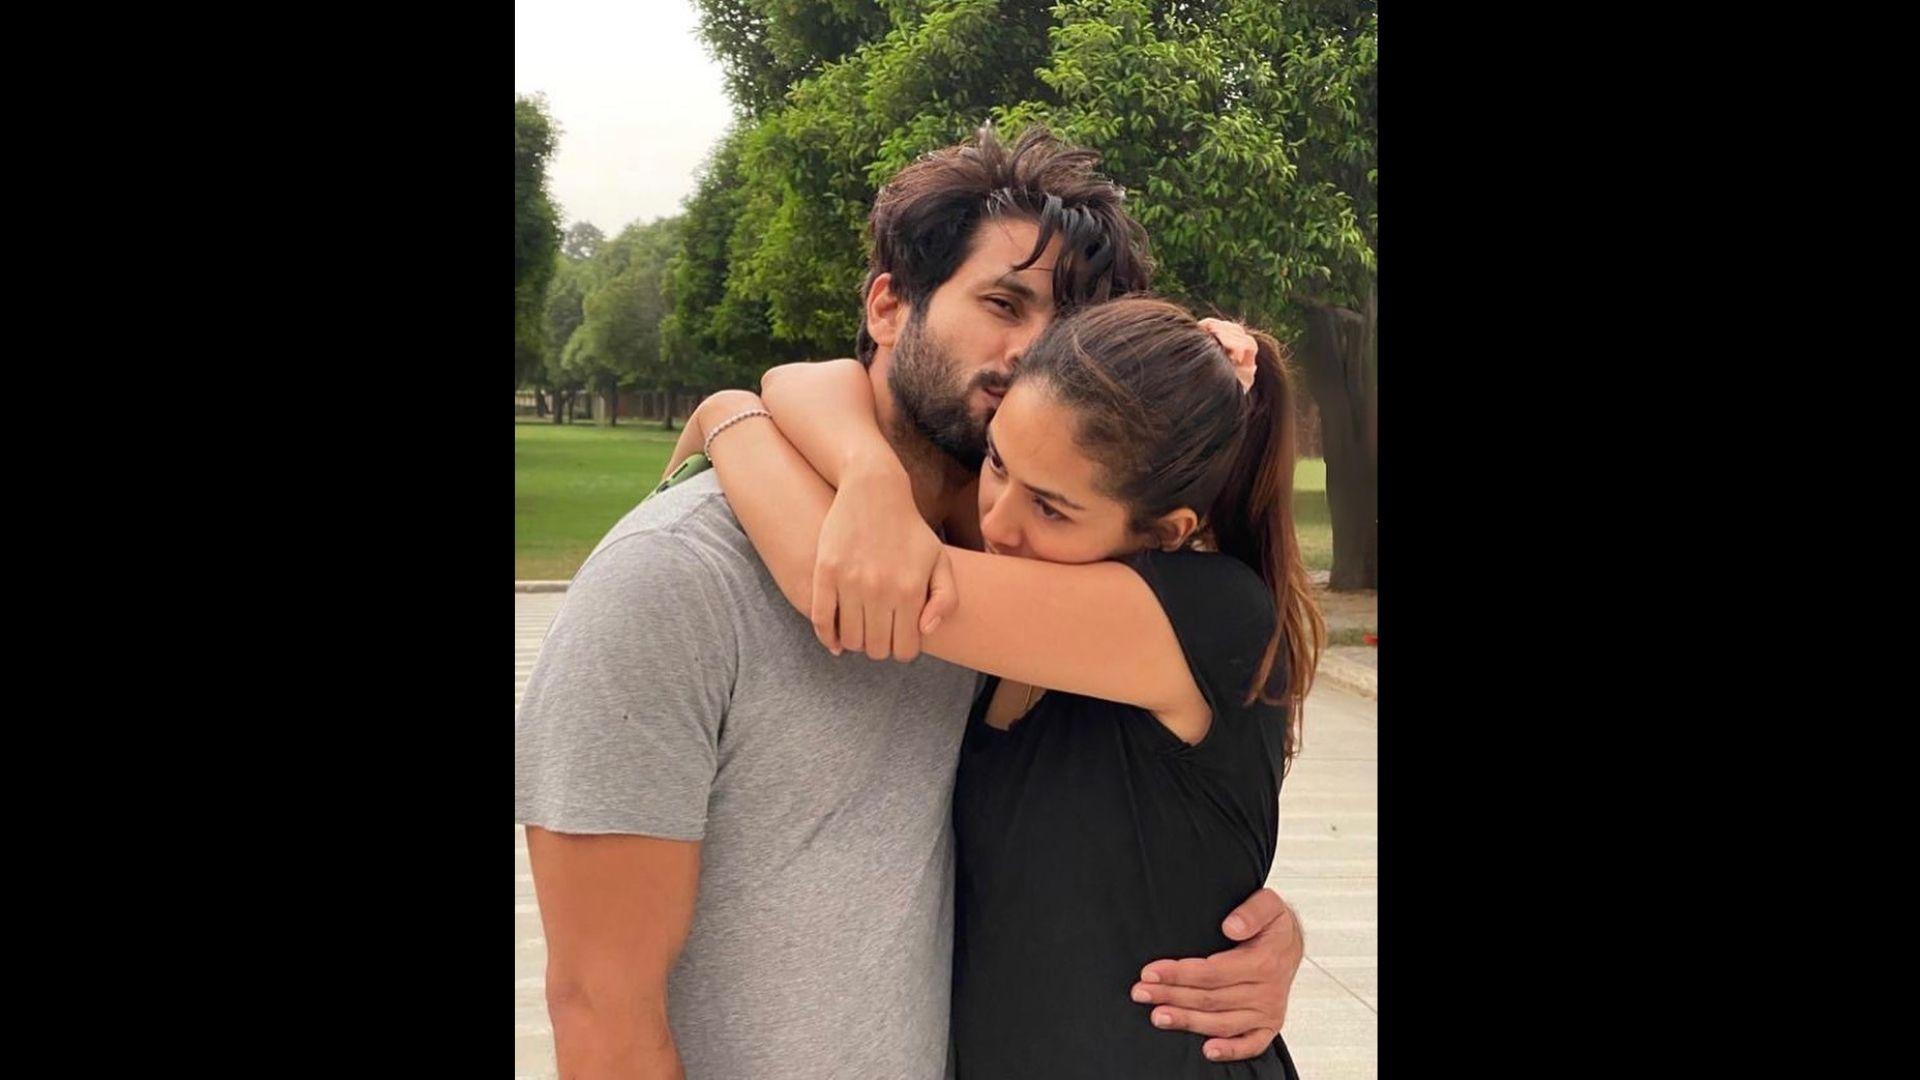 Mira Rajput Kapoor Consigns Her Love To Her Husband Shahid Kapoor At The Beautiful Maldives – SEE PICS